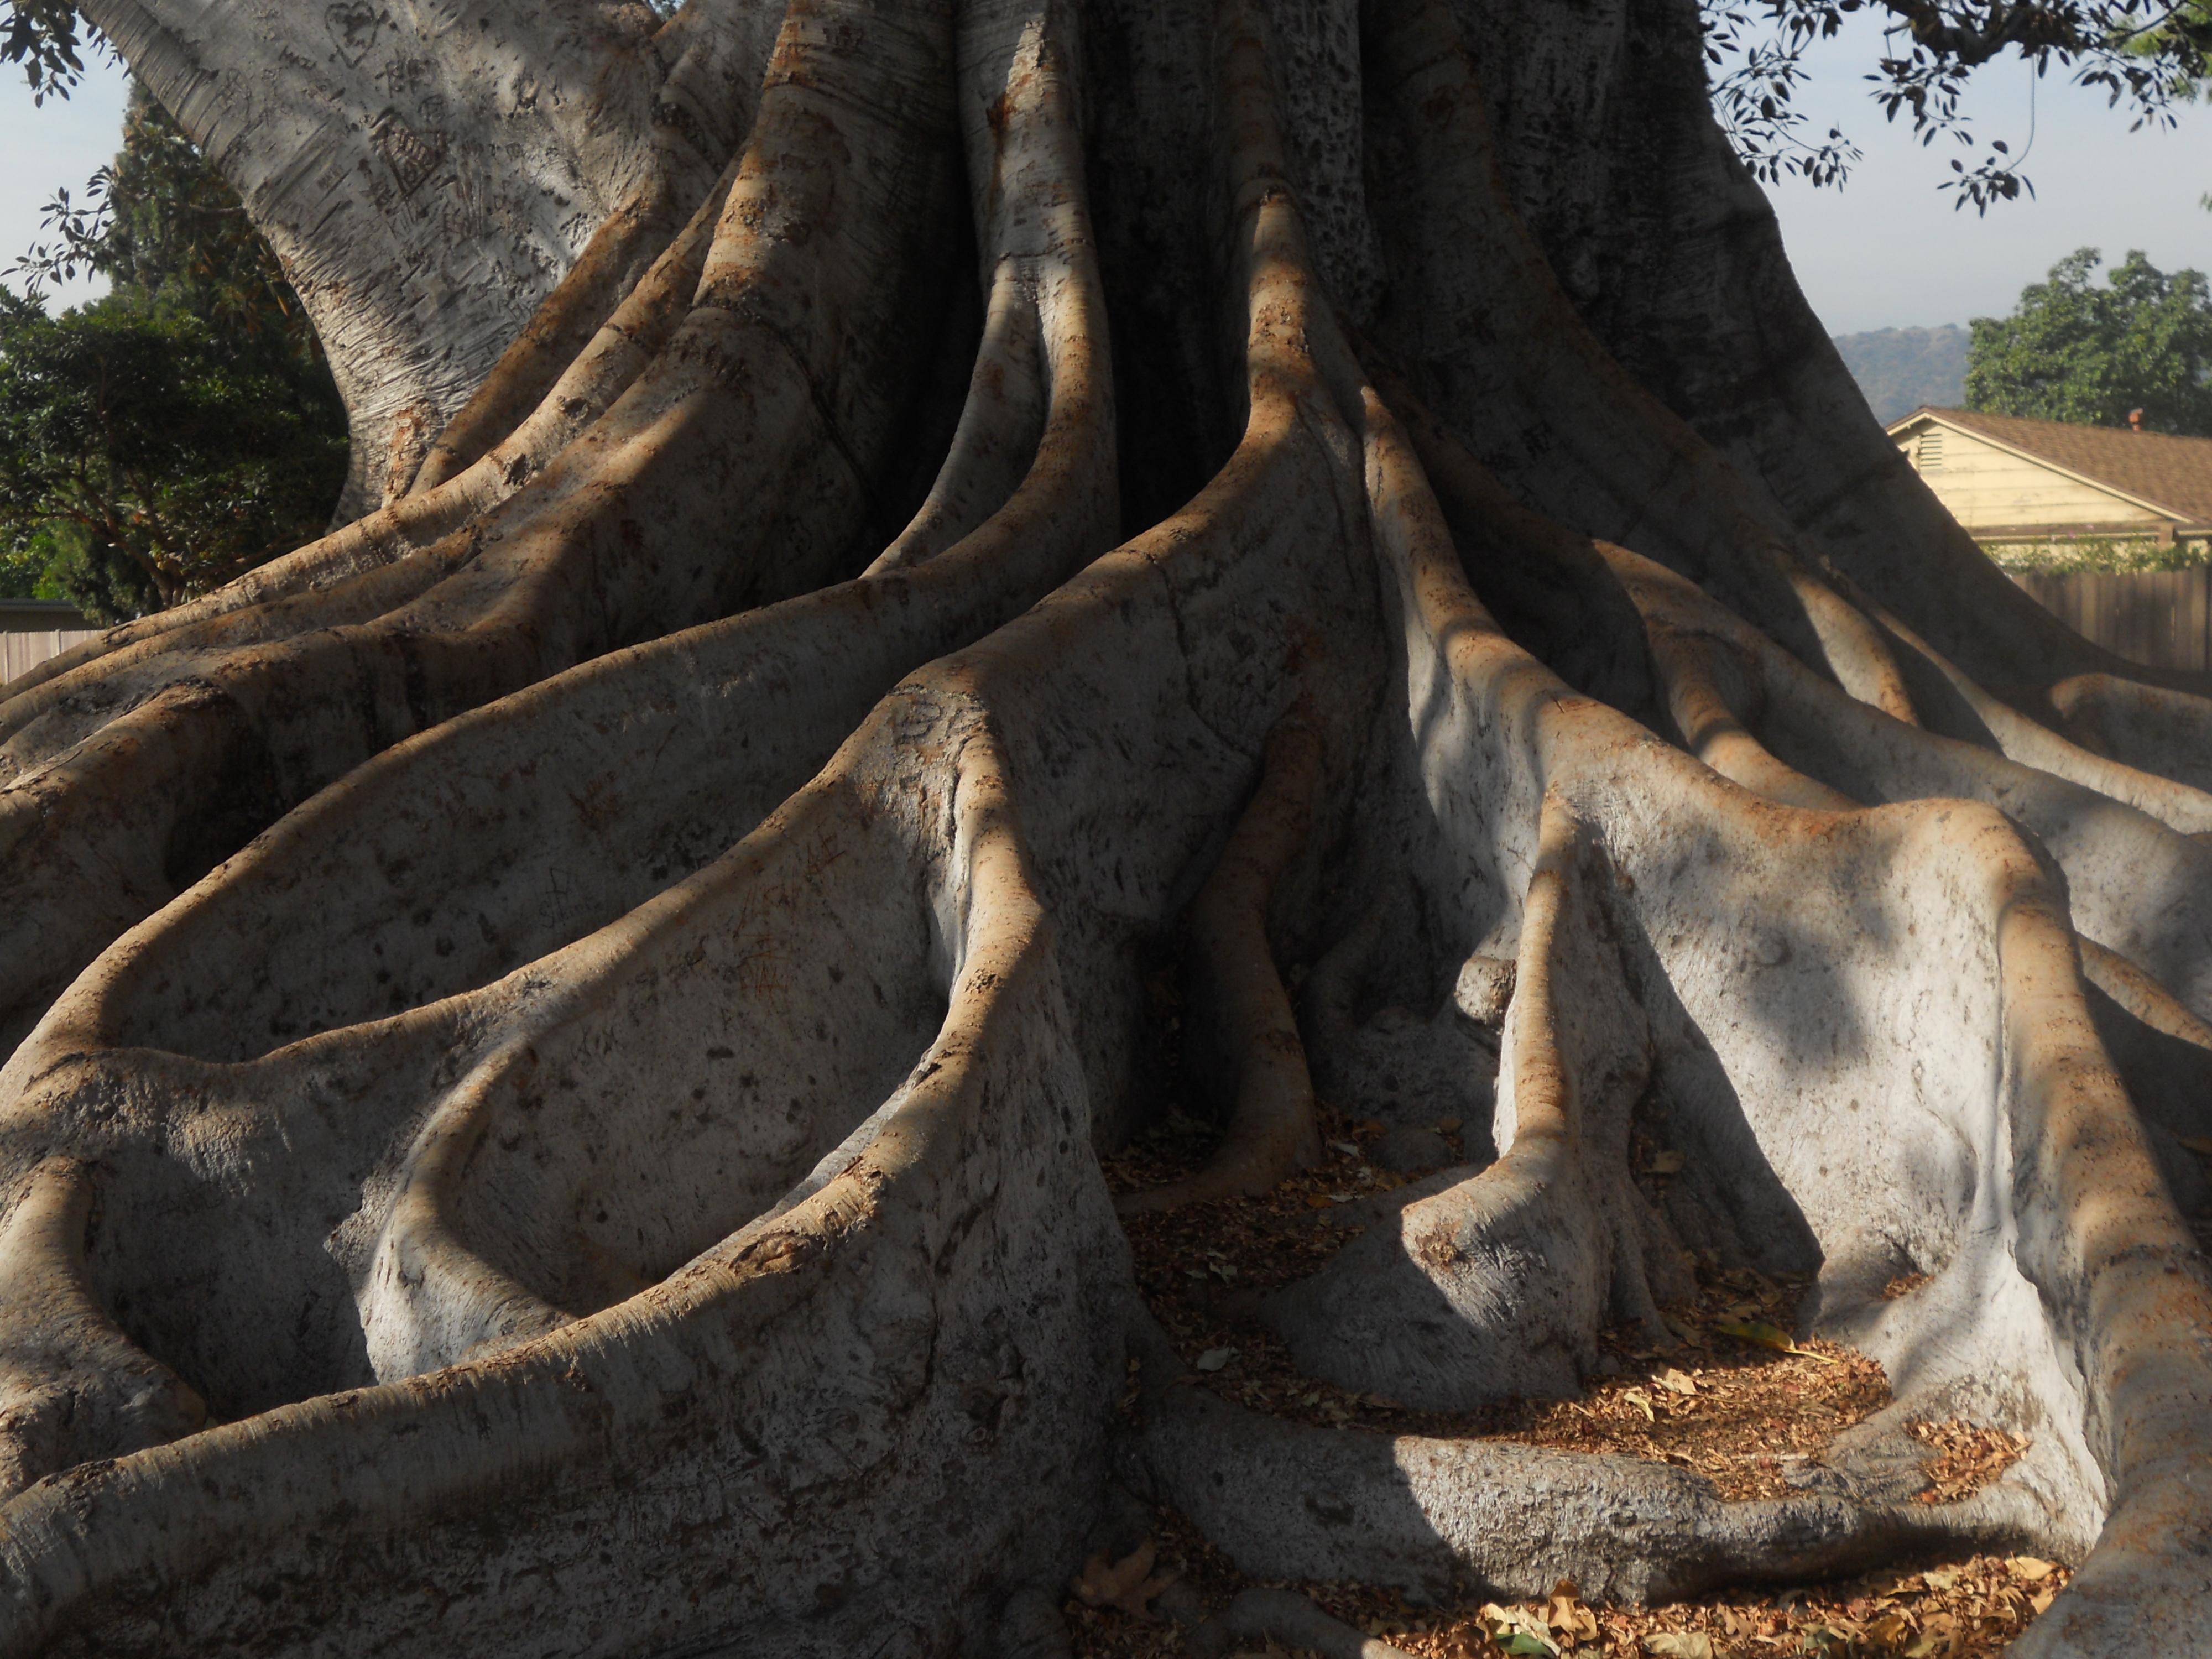 Big Tree Trunk - breathelighter